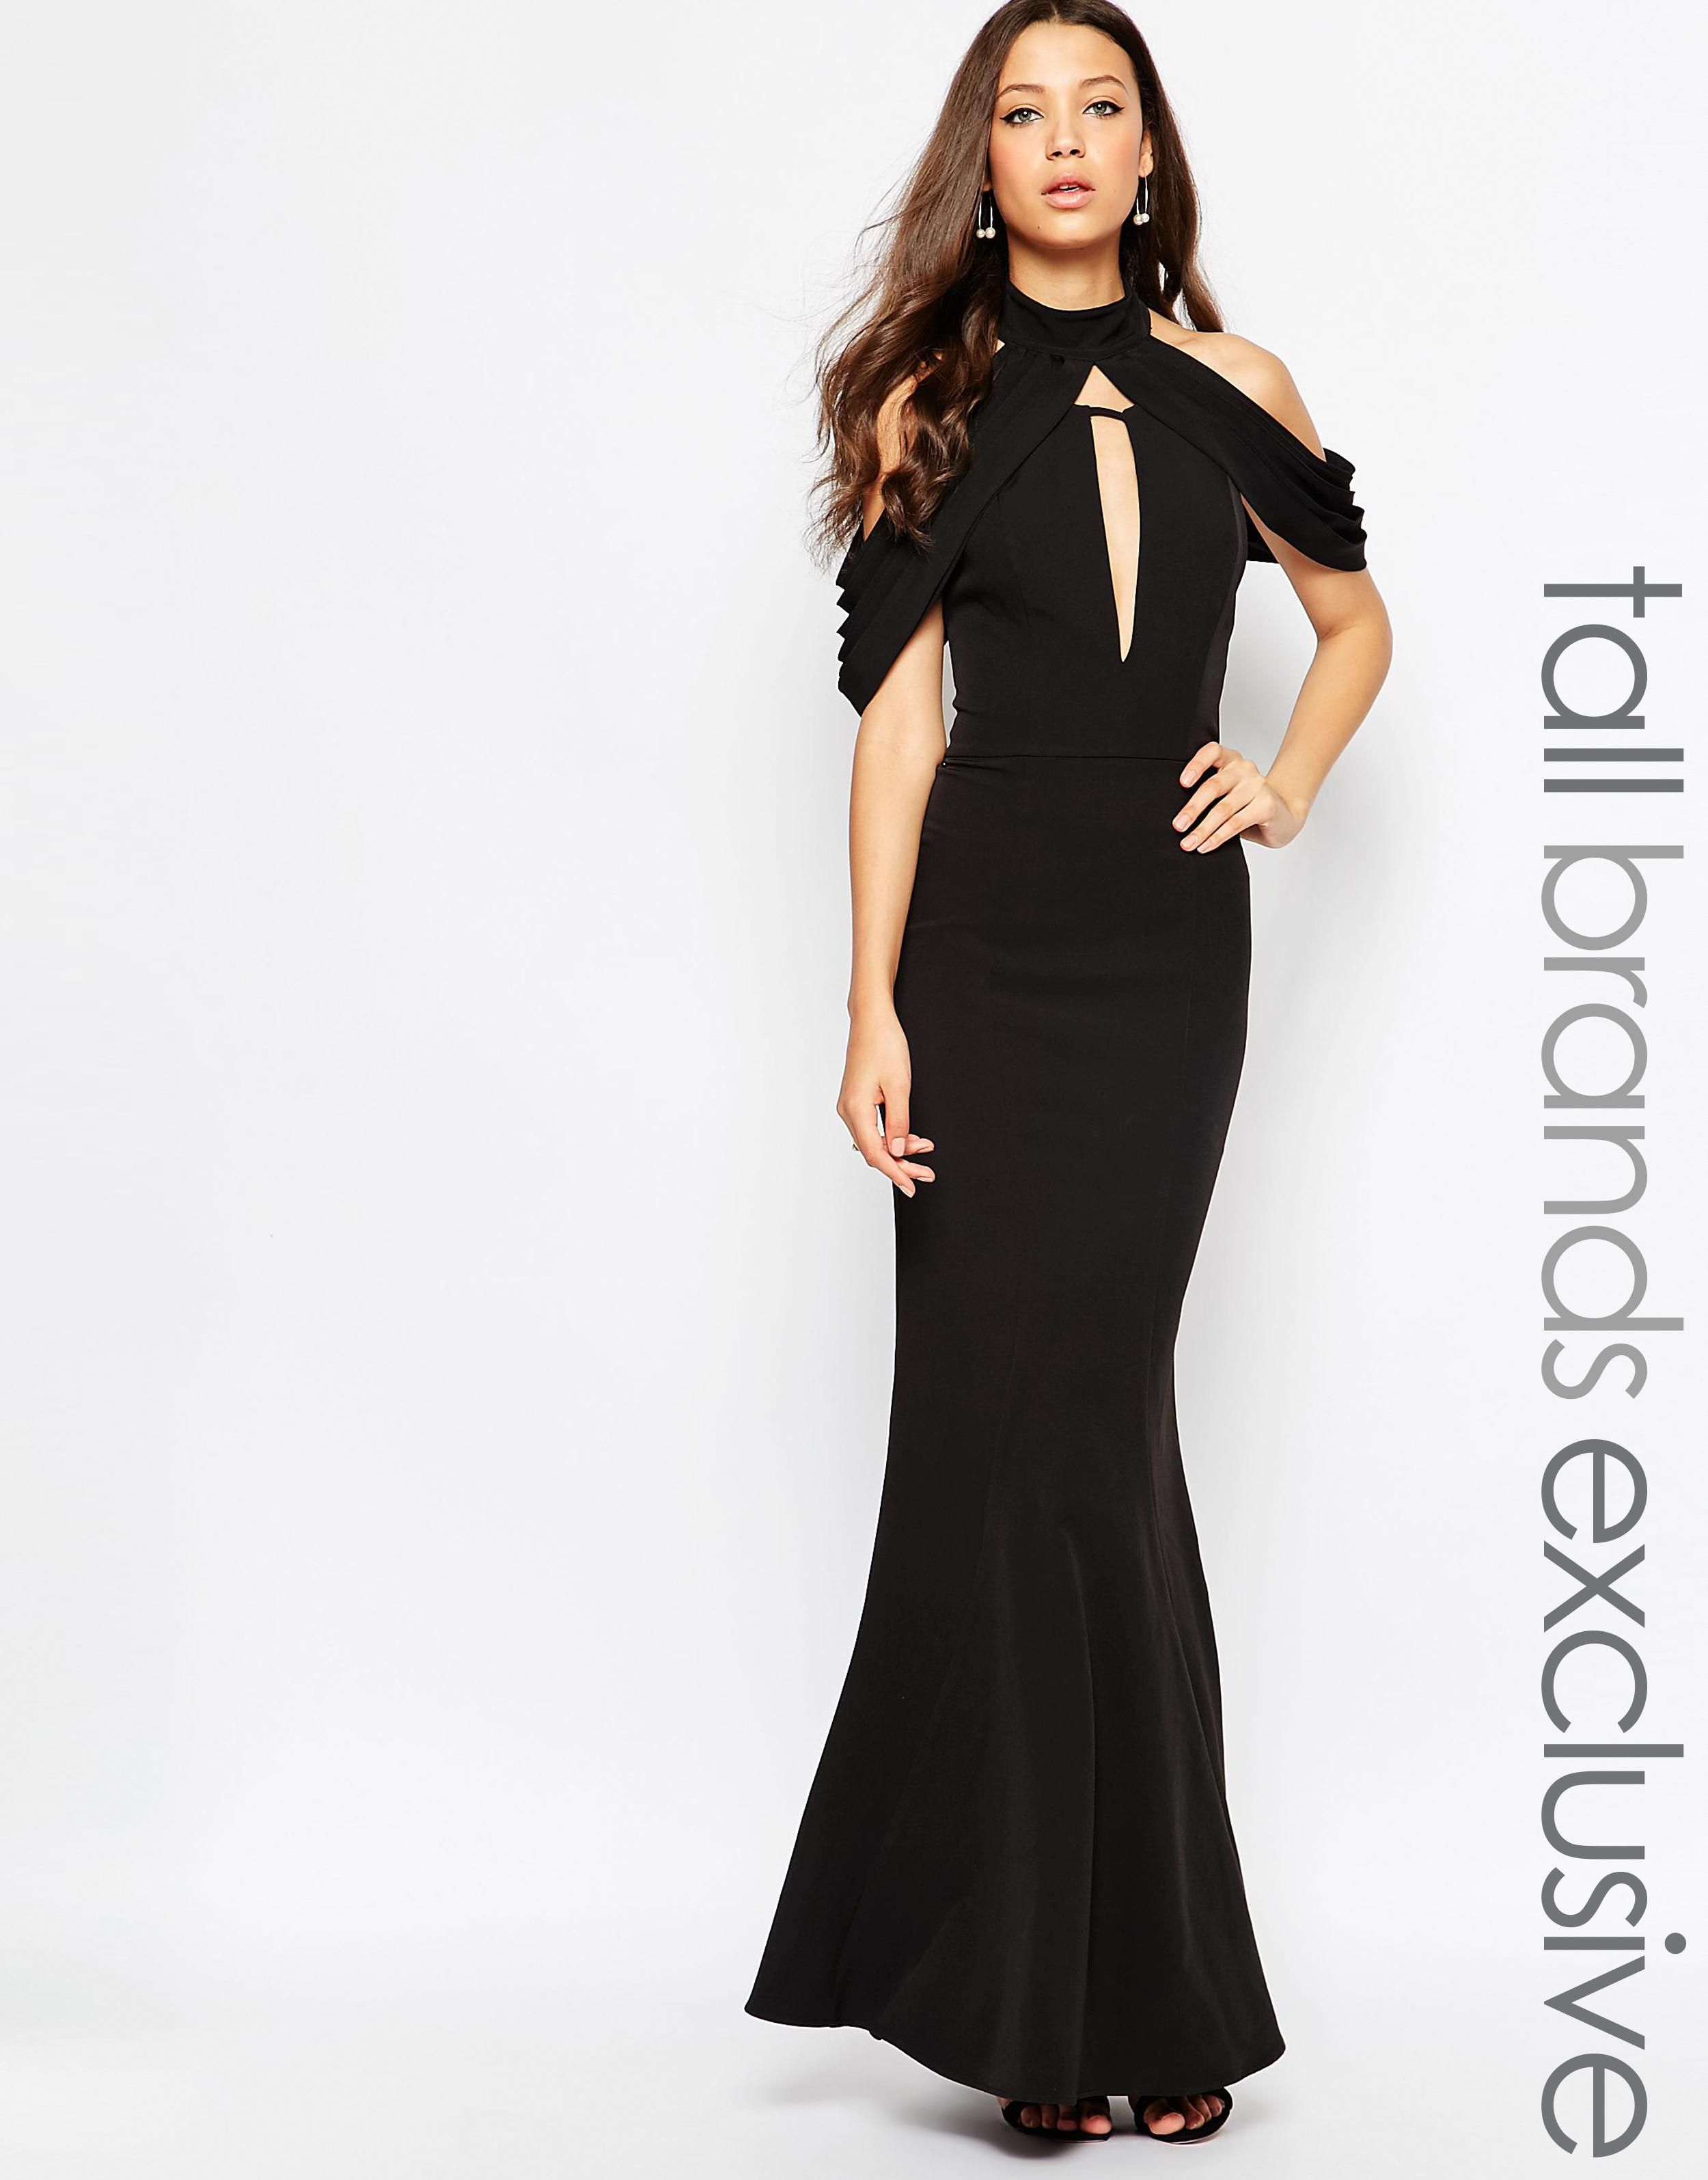 Us Asos Com Jarlo Tall Multi Strap Keyhole Maxi Dress Candice Blackburn 5699761 Black Dresses Maxi Dress Style Maxi Dress [ 3190 x 2500 Pixel ]